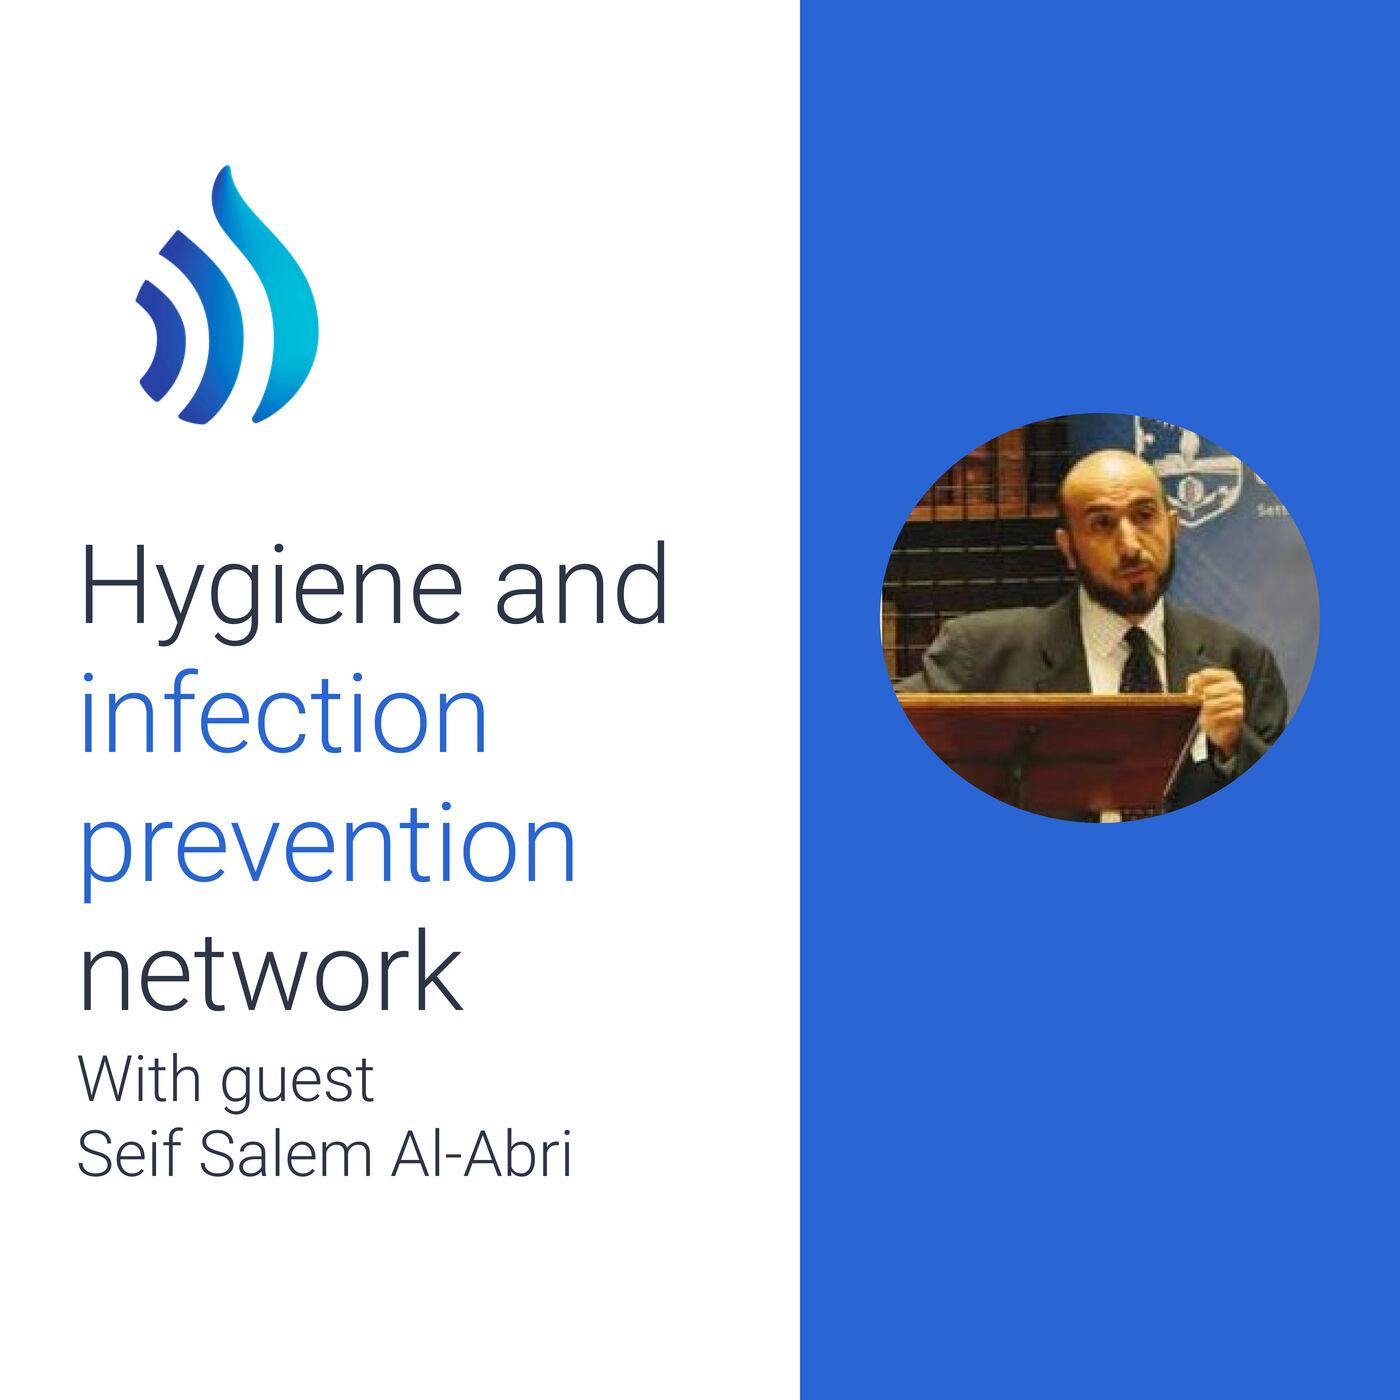 #10 Seif Salem Al-Abri on a proficient commitment to disease surveillance and control (Oman)